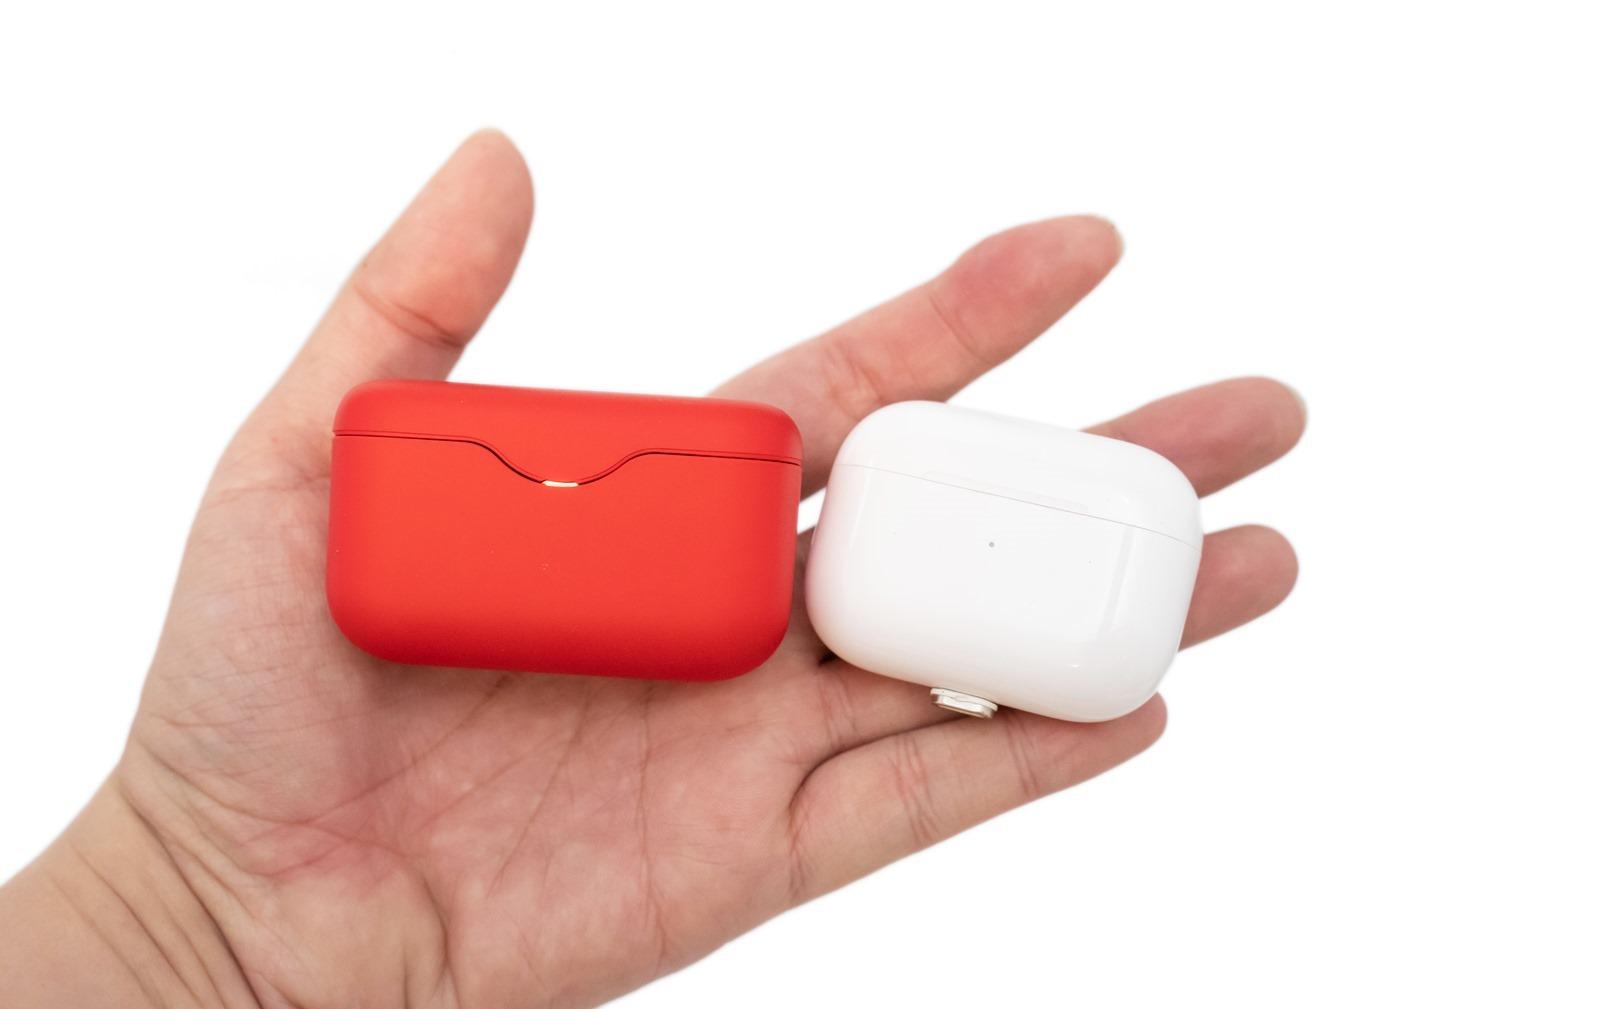 Sony 最小巧真無線耳機 WF-H800 開箱!要音質要輕巧還要好看!! @3C 達人廖阿輝